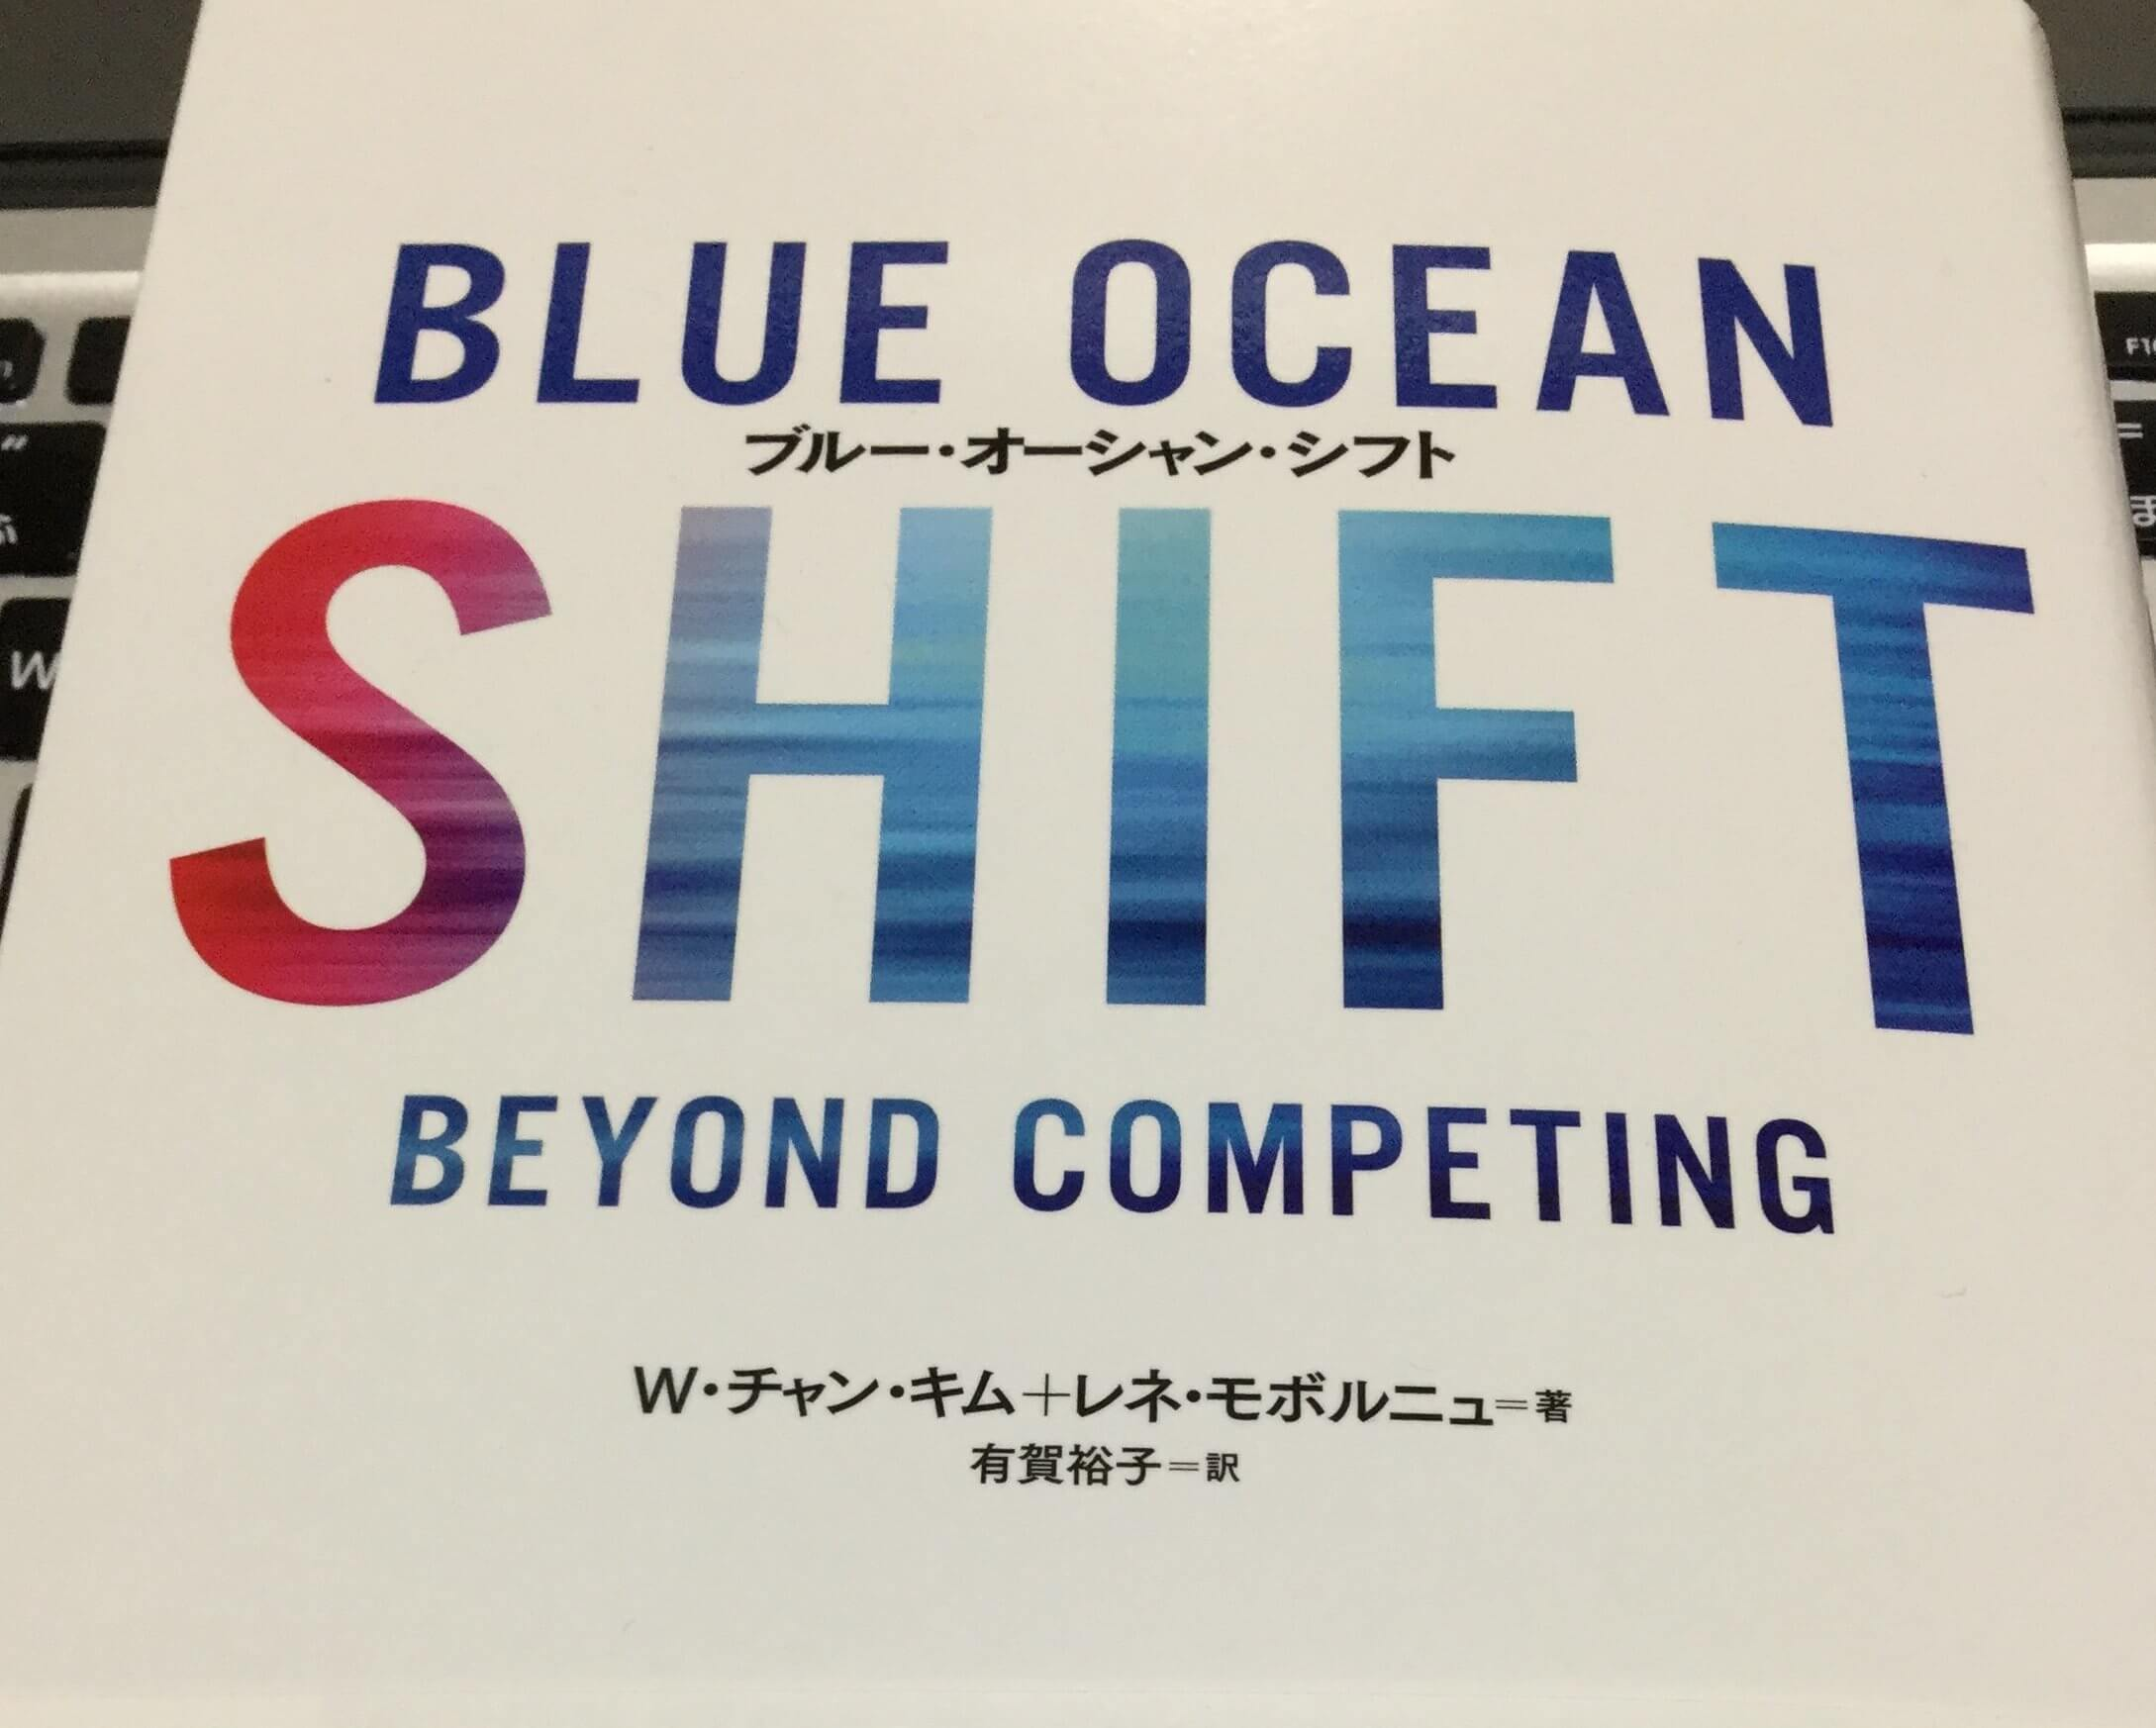 IMG 0228 e1543498877121 - 【書評】マーケティングの切り口を変えよう。「Blue Ocean Shift」